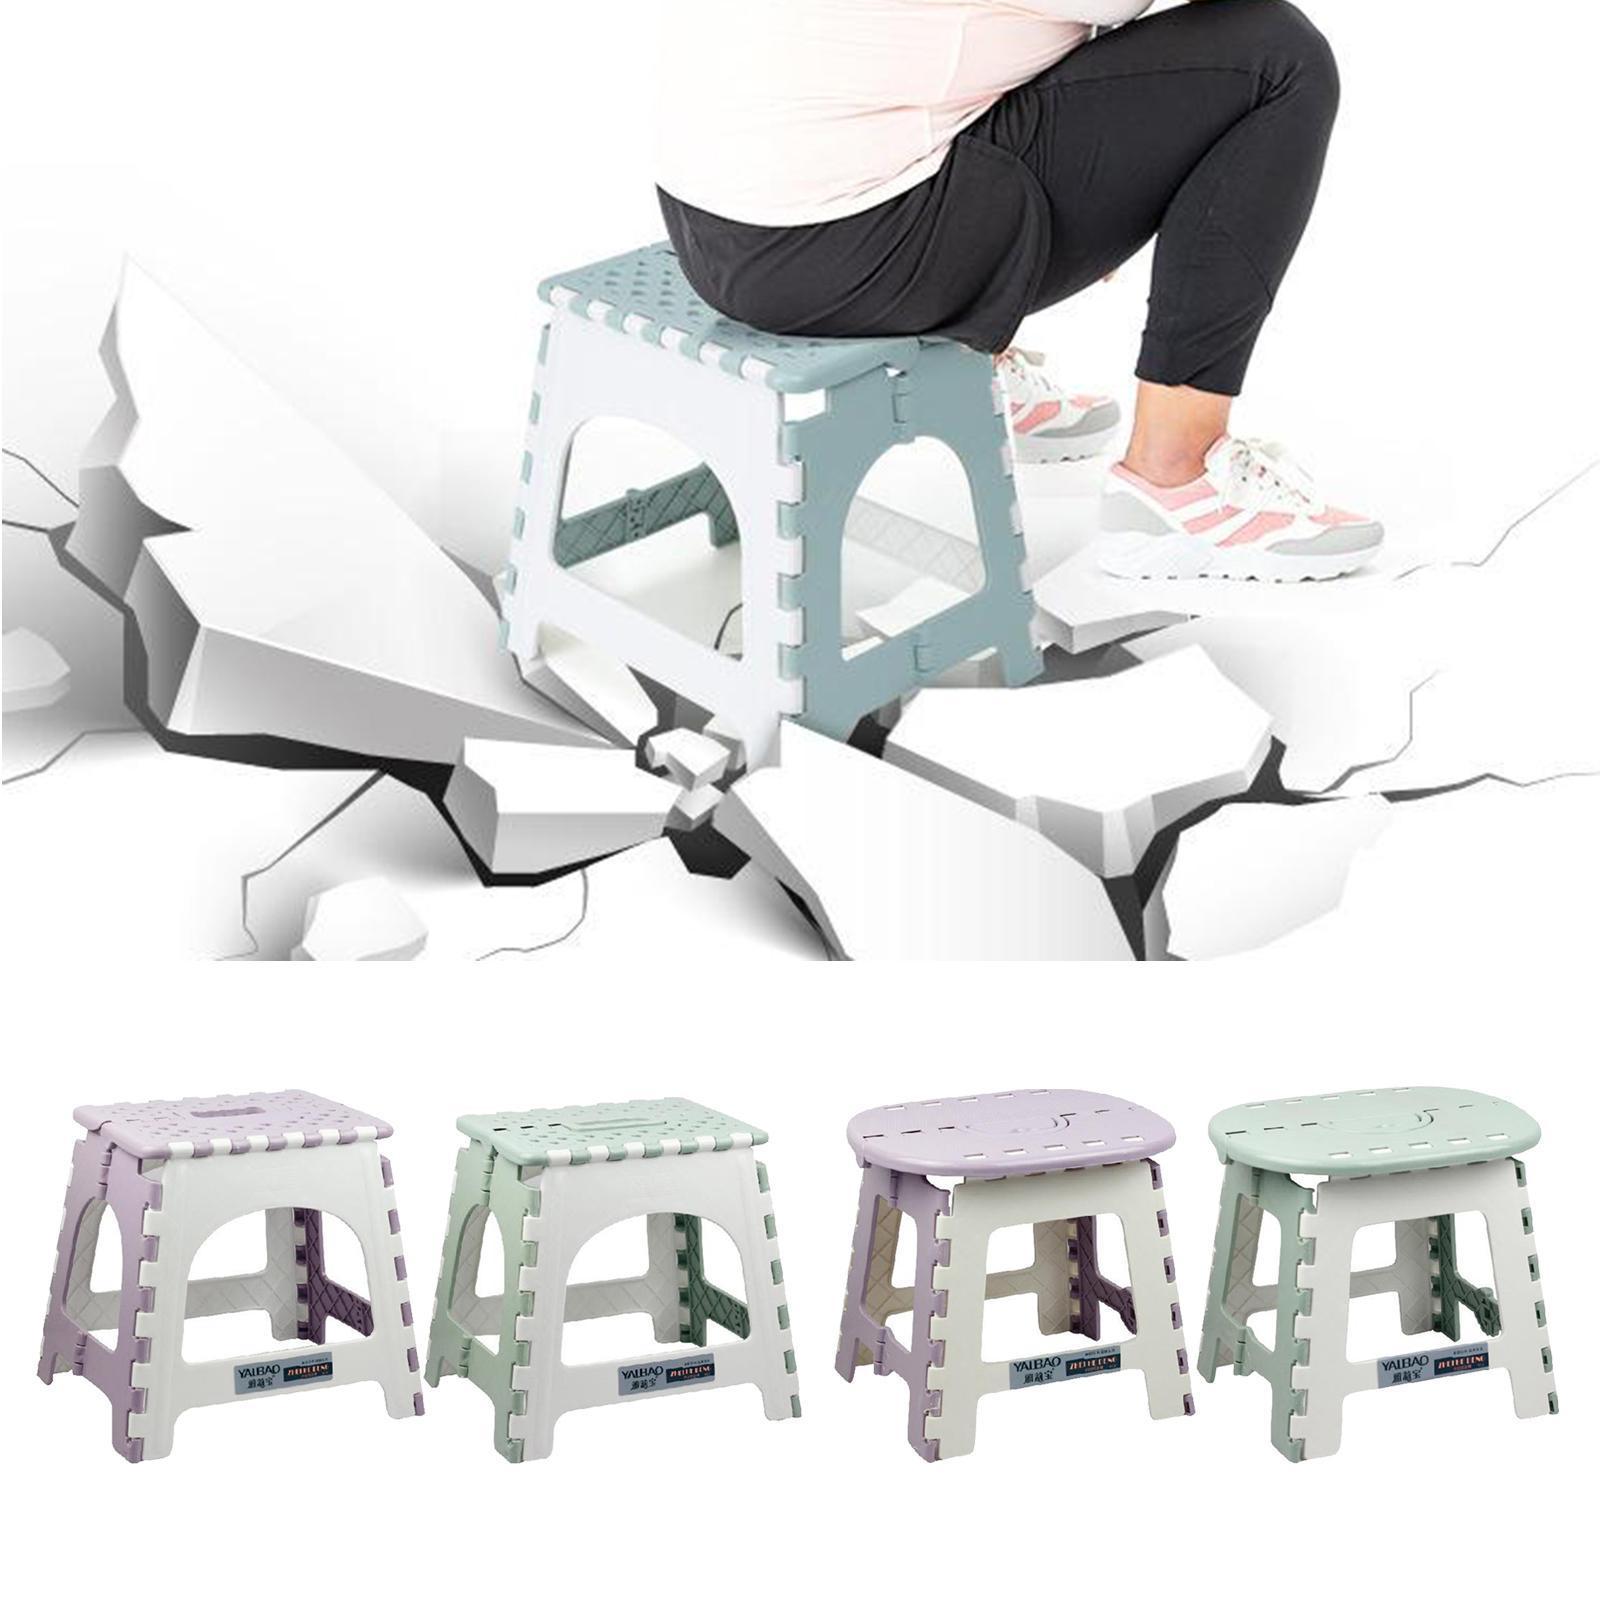 Cargas pesadas plegable taburete se produce plástico fußleiter para niños adultos casa